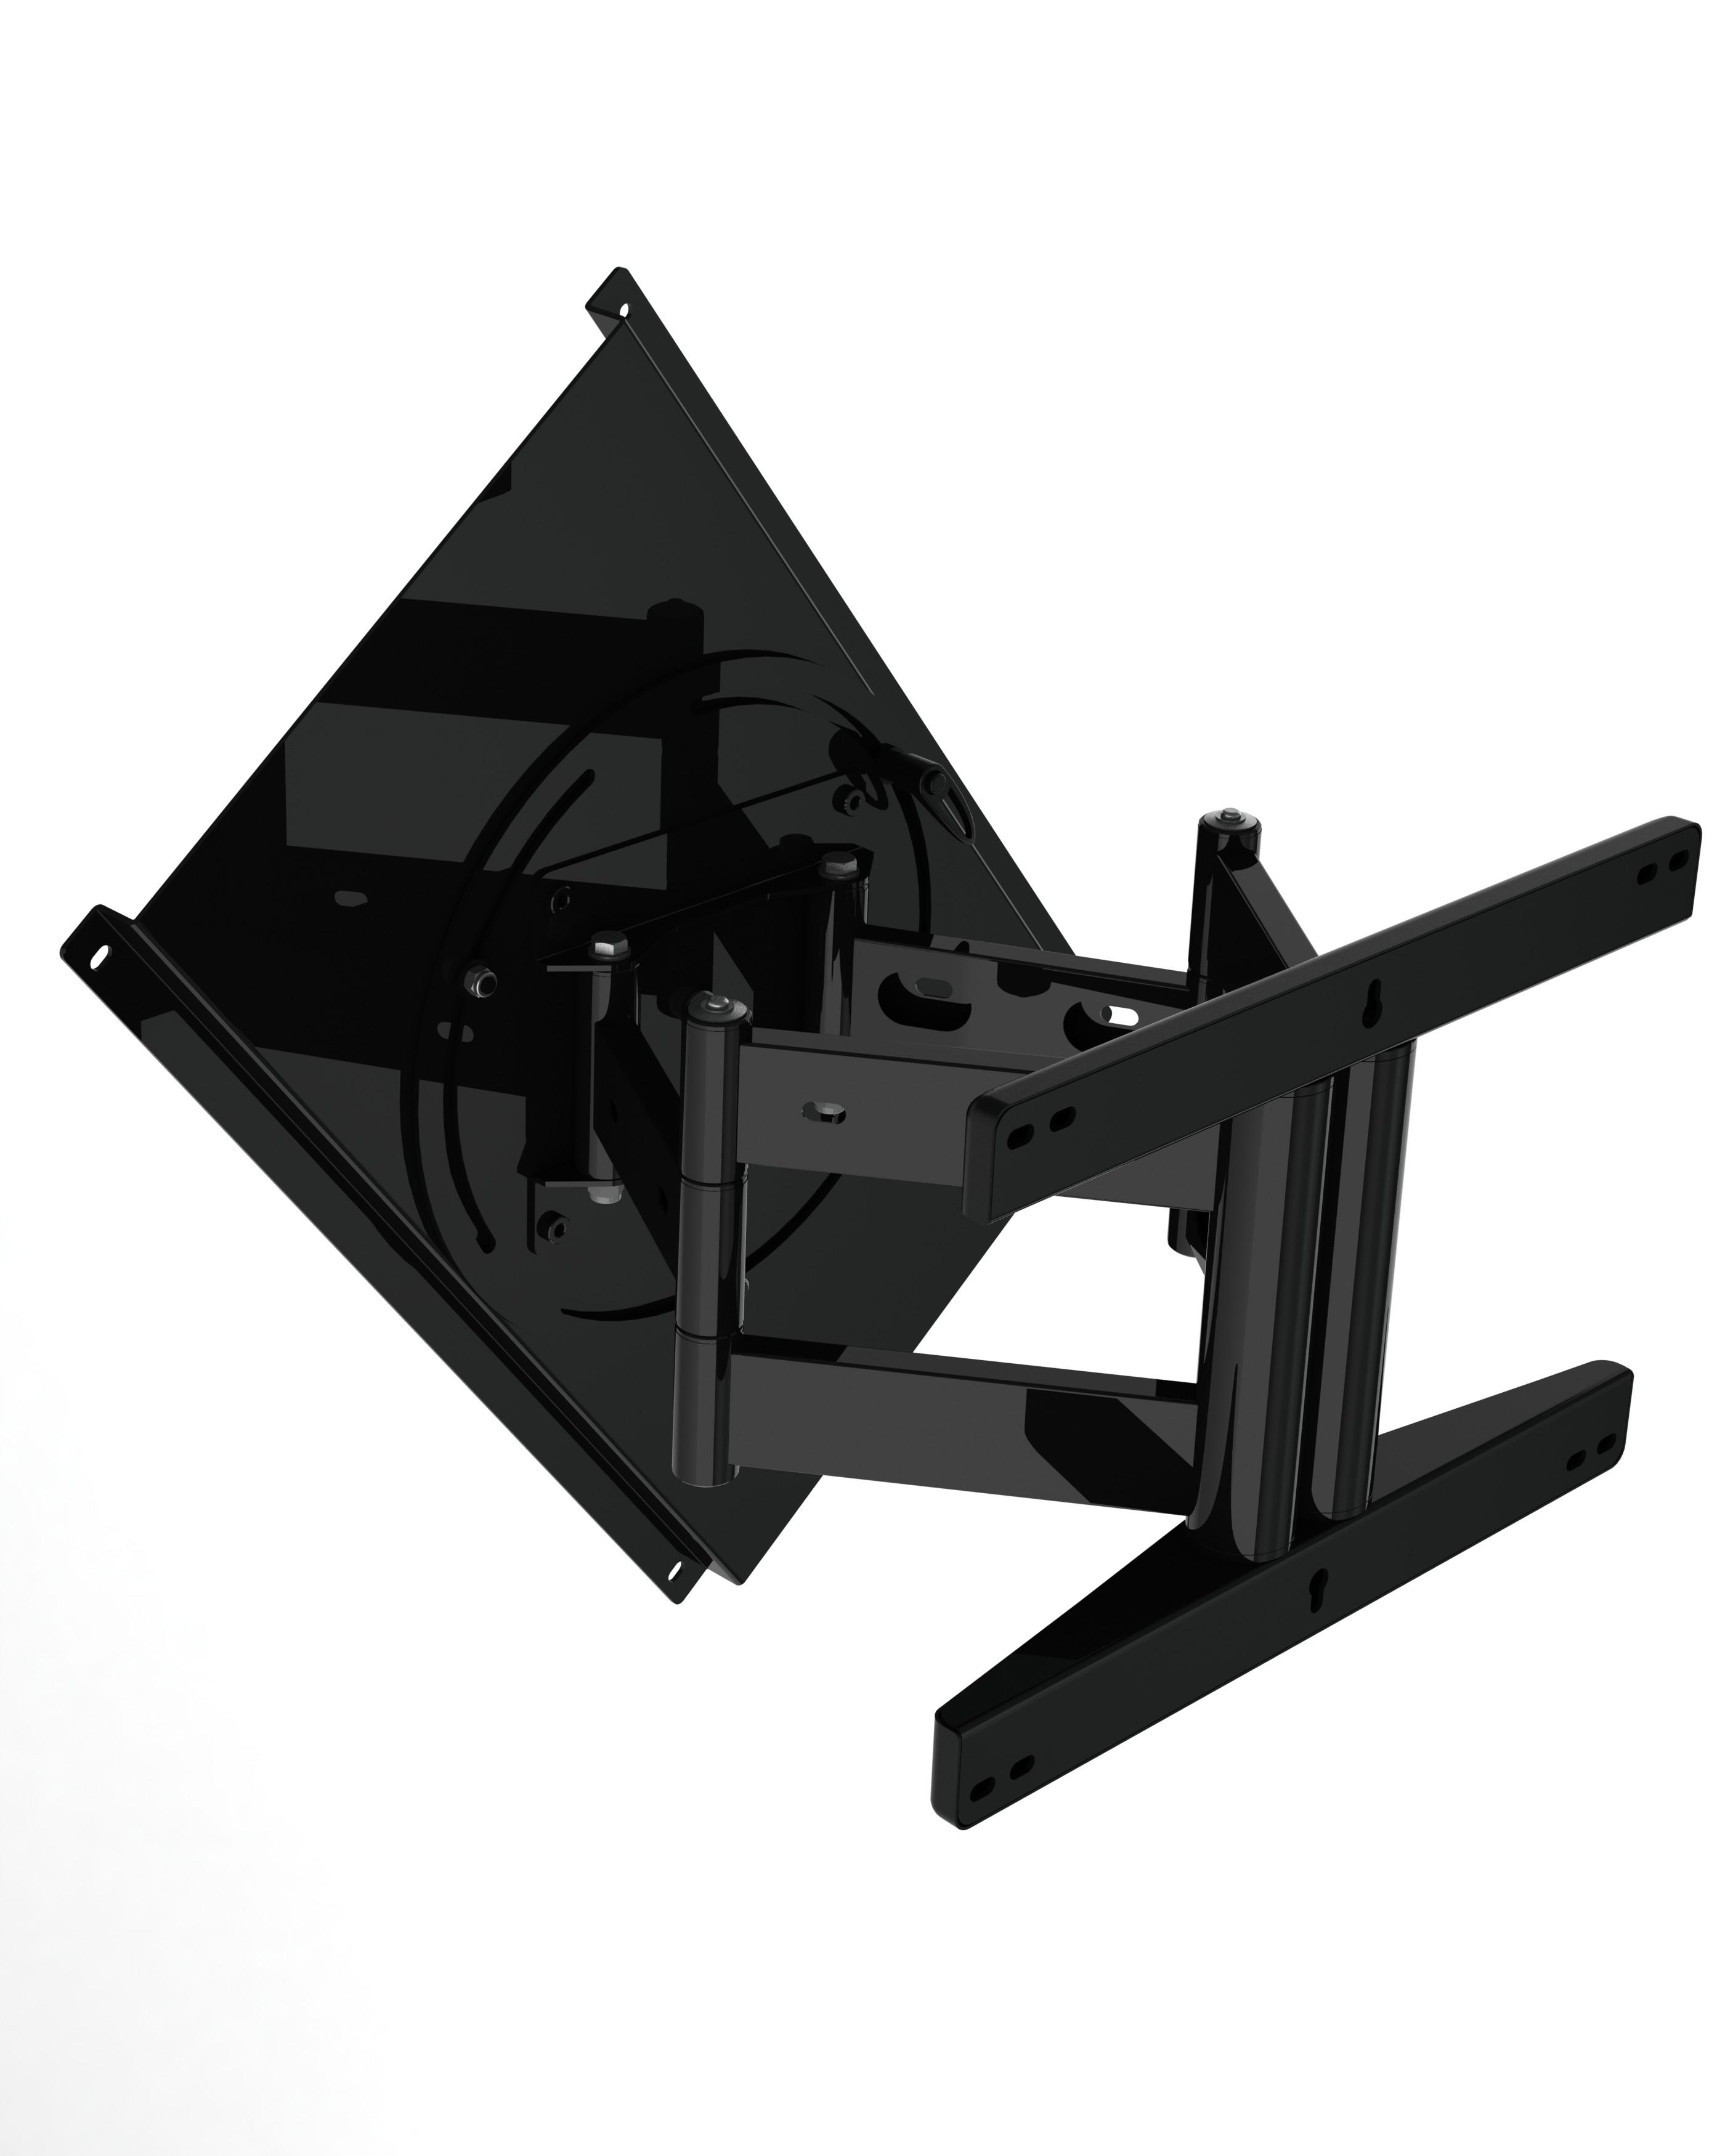 Bespoke Rotatable - Articulated TV bracket concept - 01.JPG